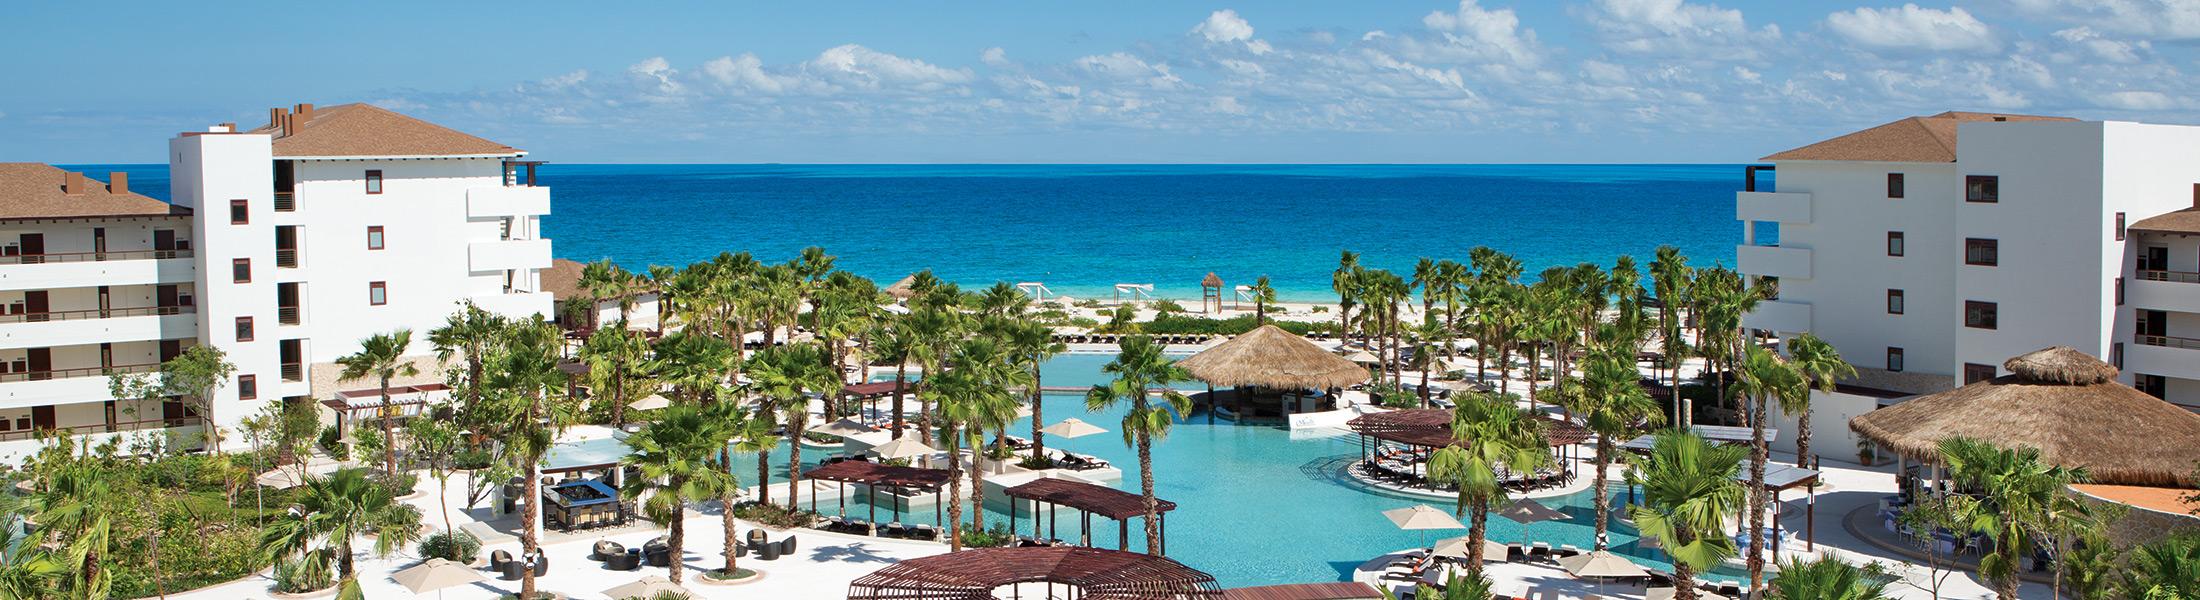 Aerial view of the resort pools at Secrets Playa Mujeres